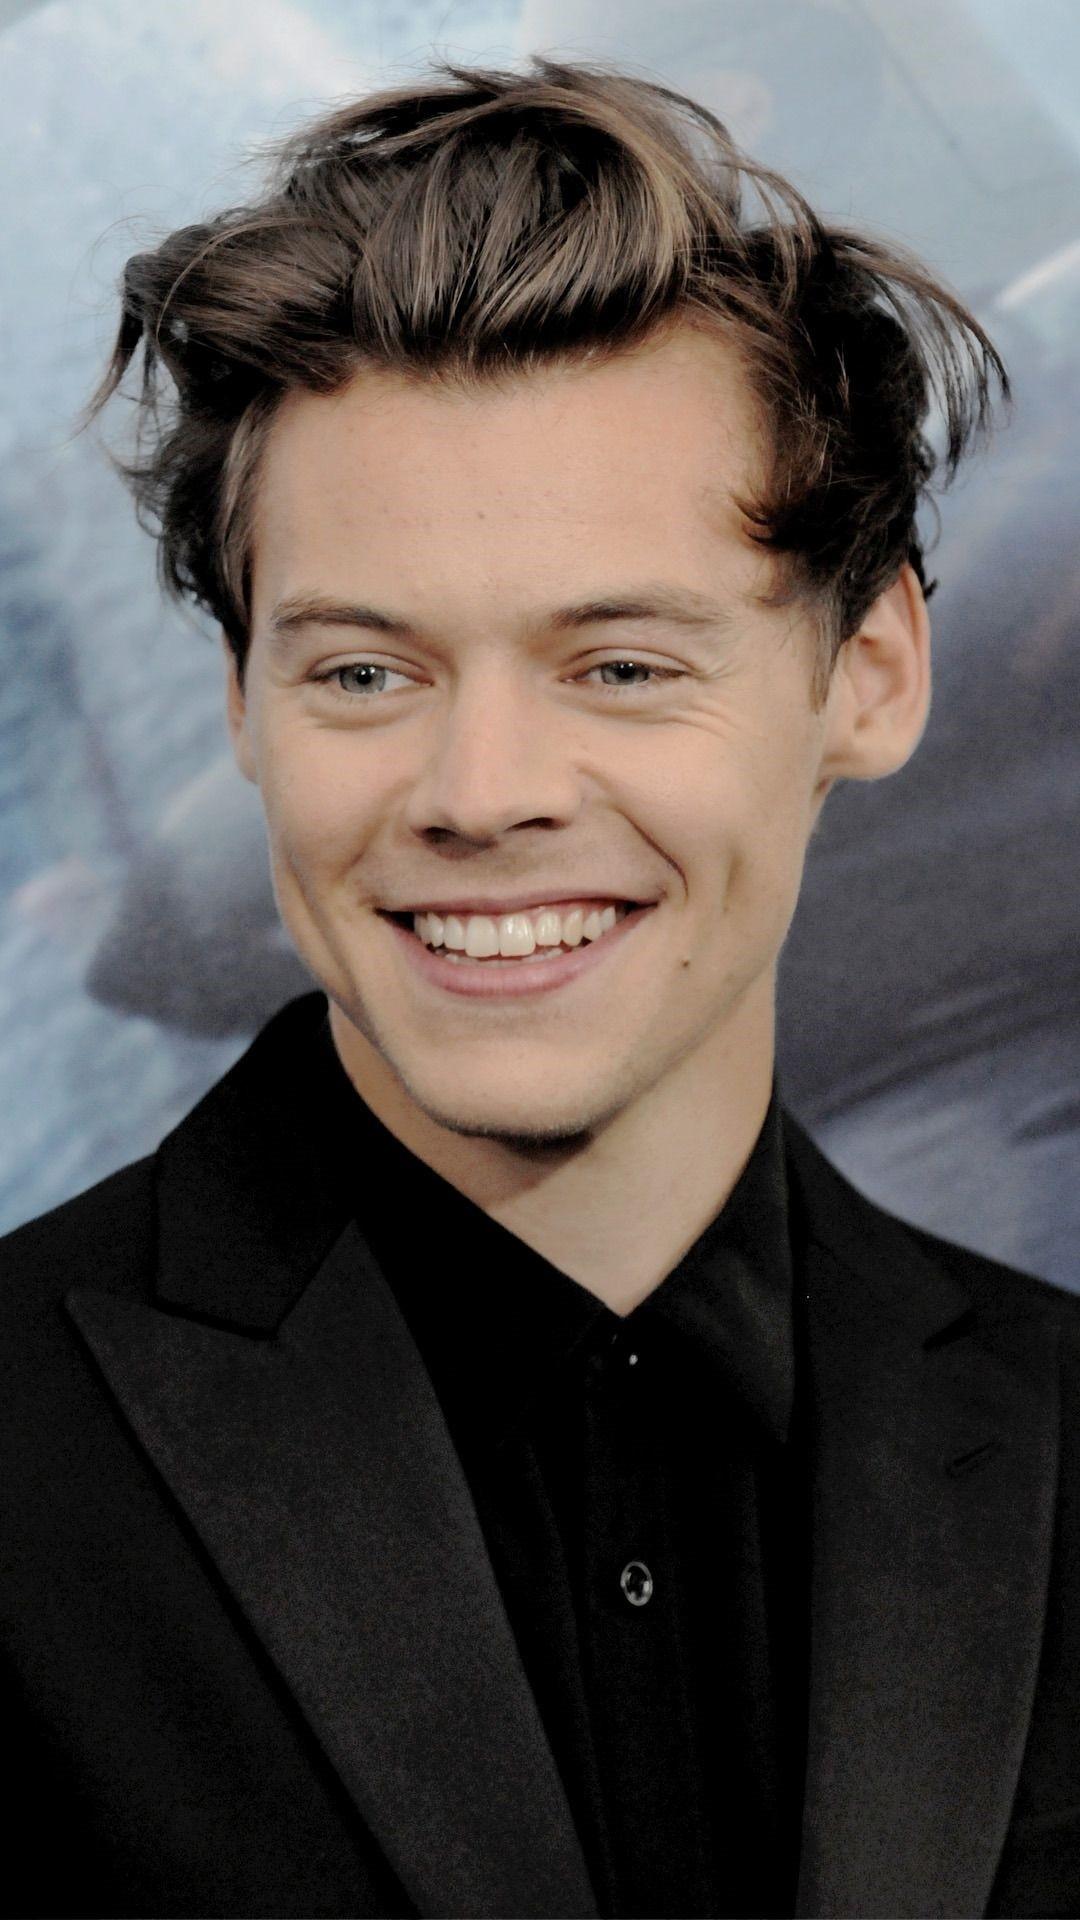 Harry Styles phone wallpaper